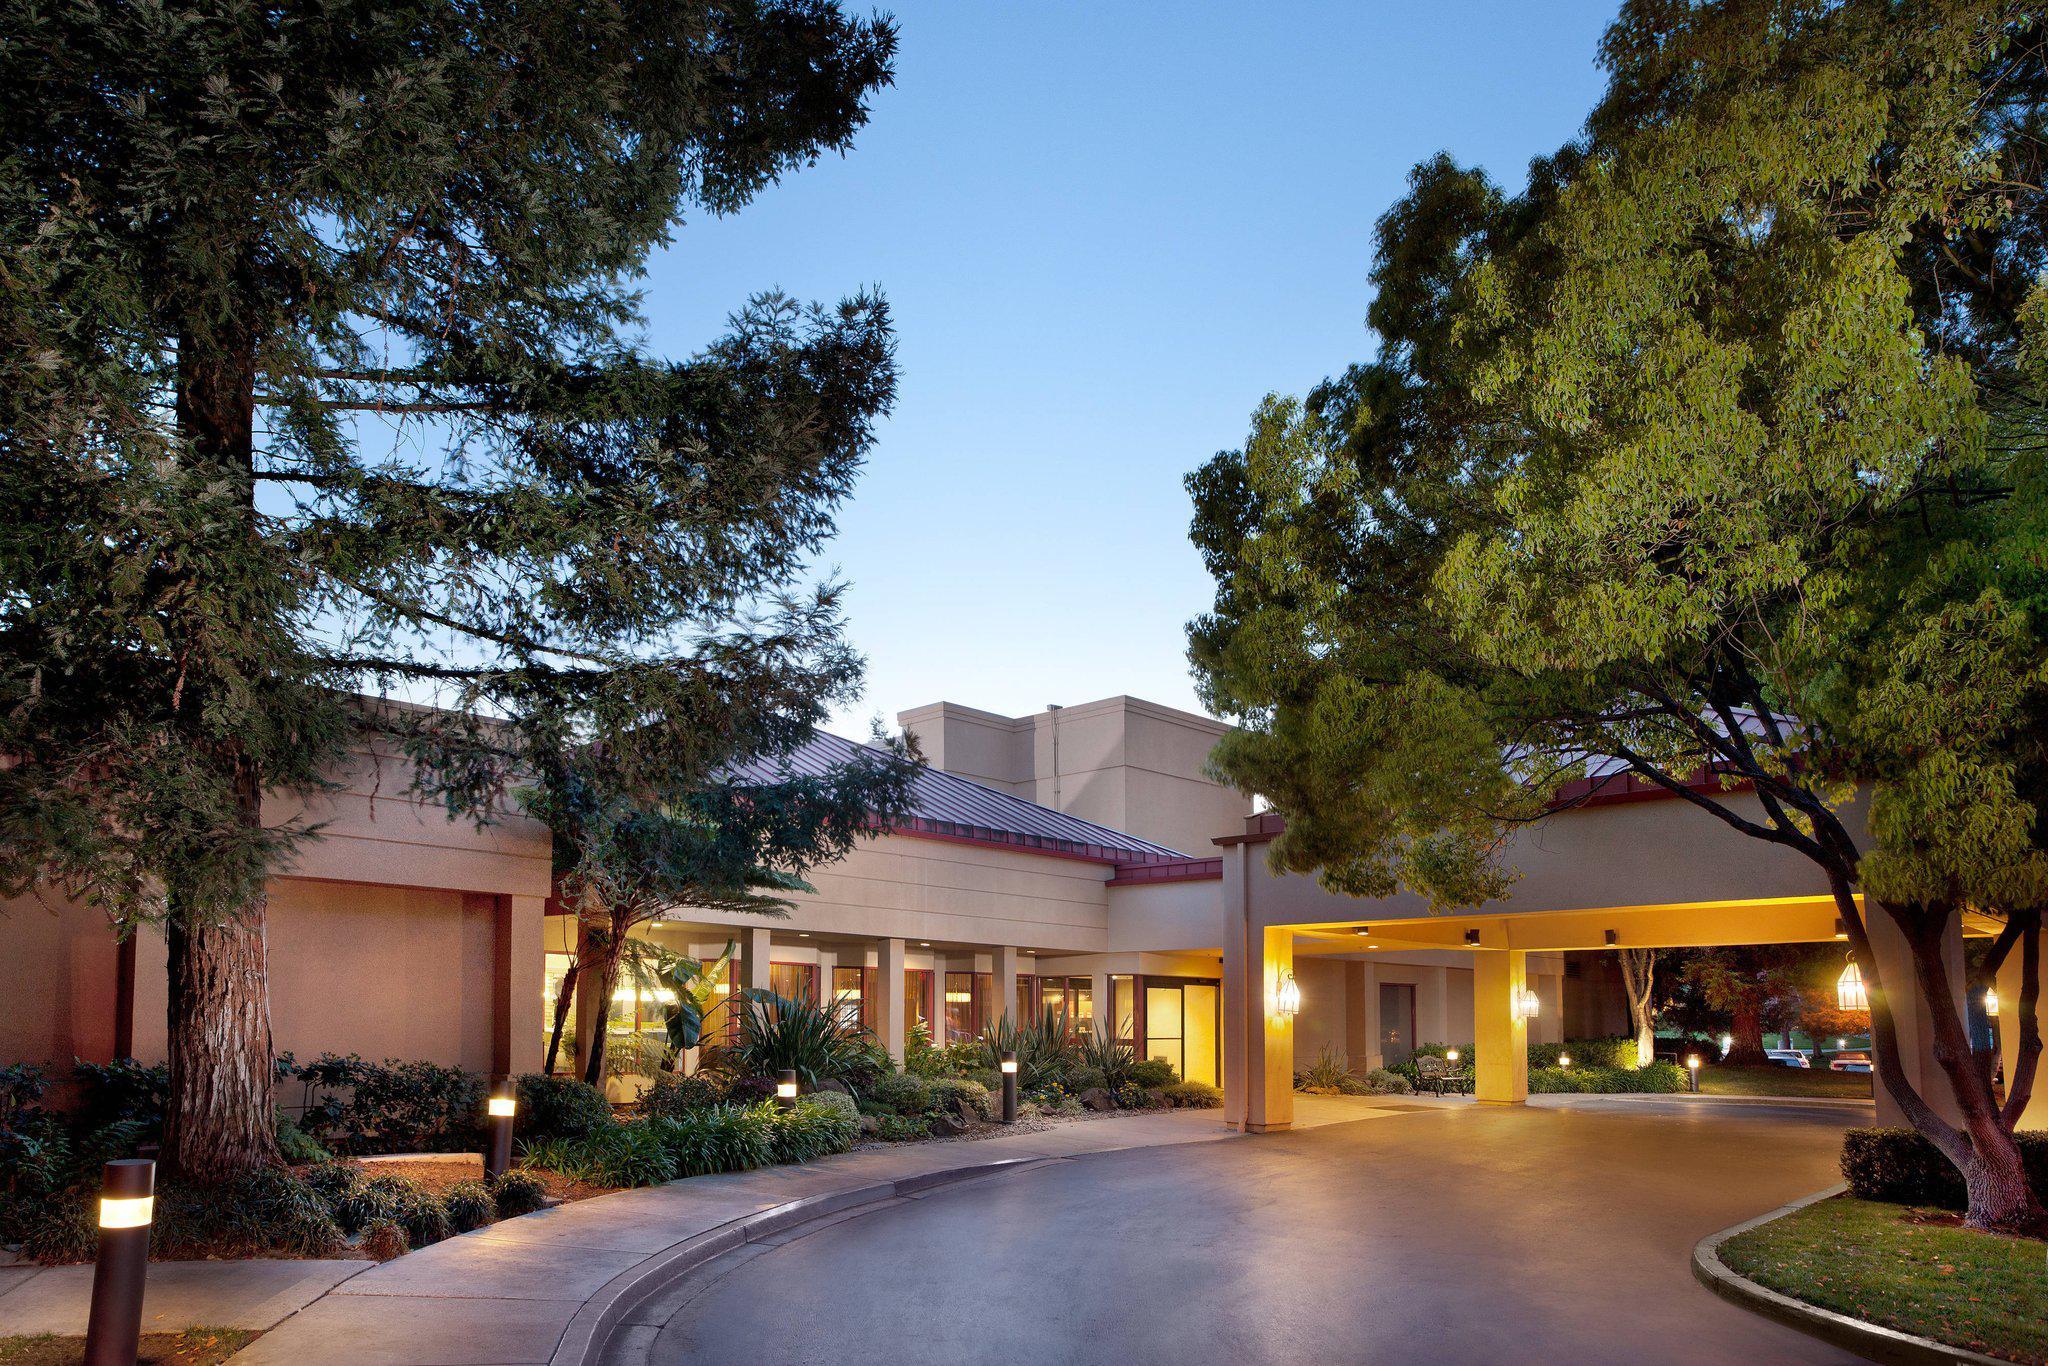 Courtyard by Marriott San Jose Airport